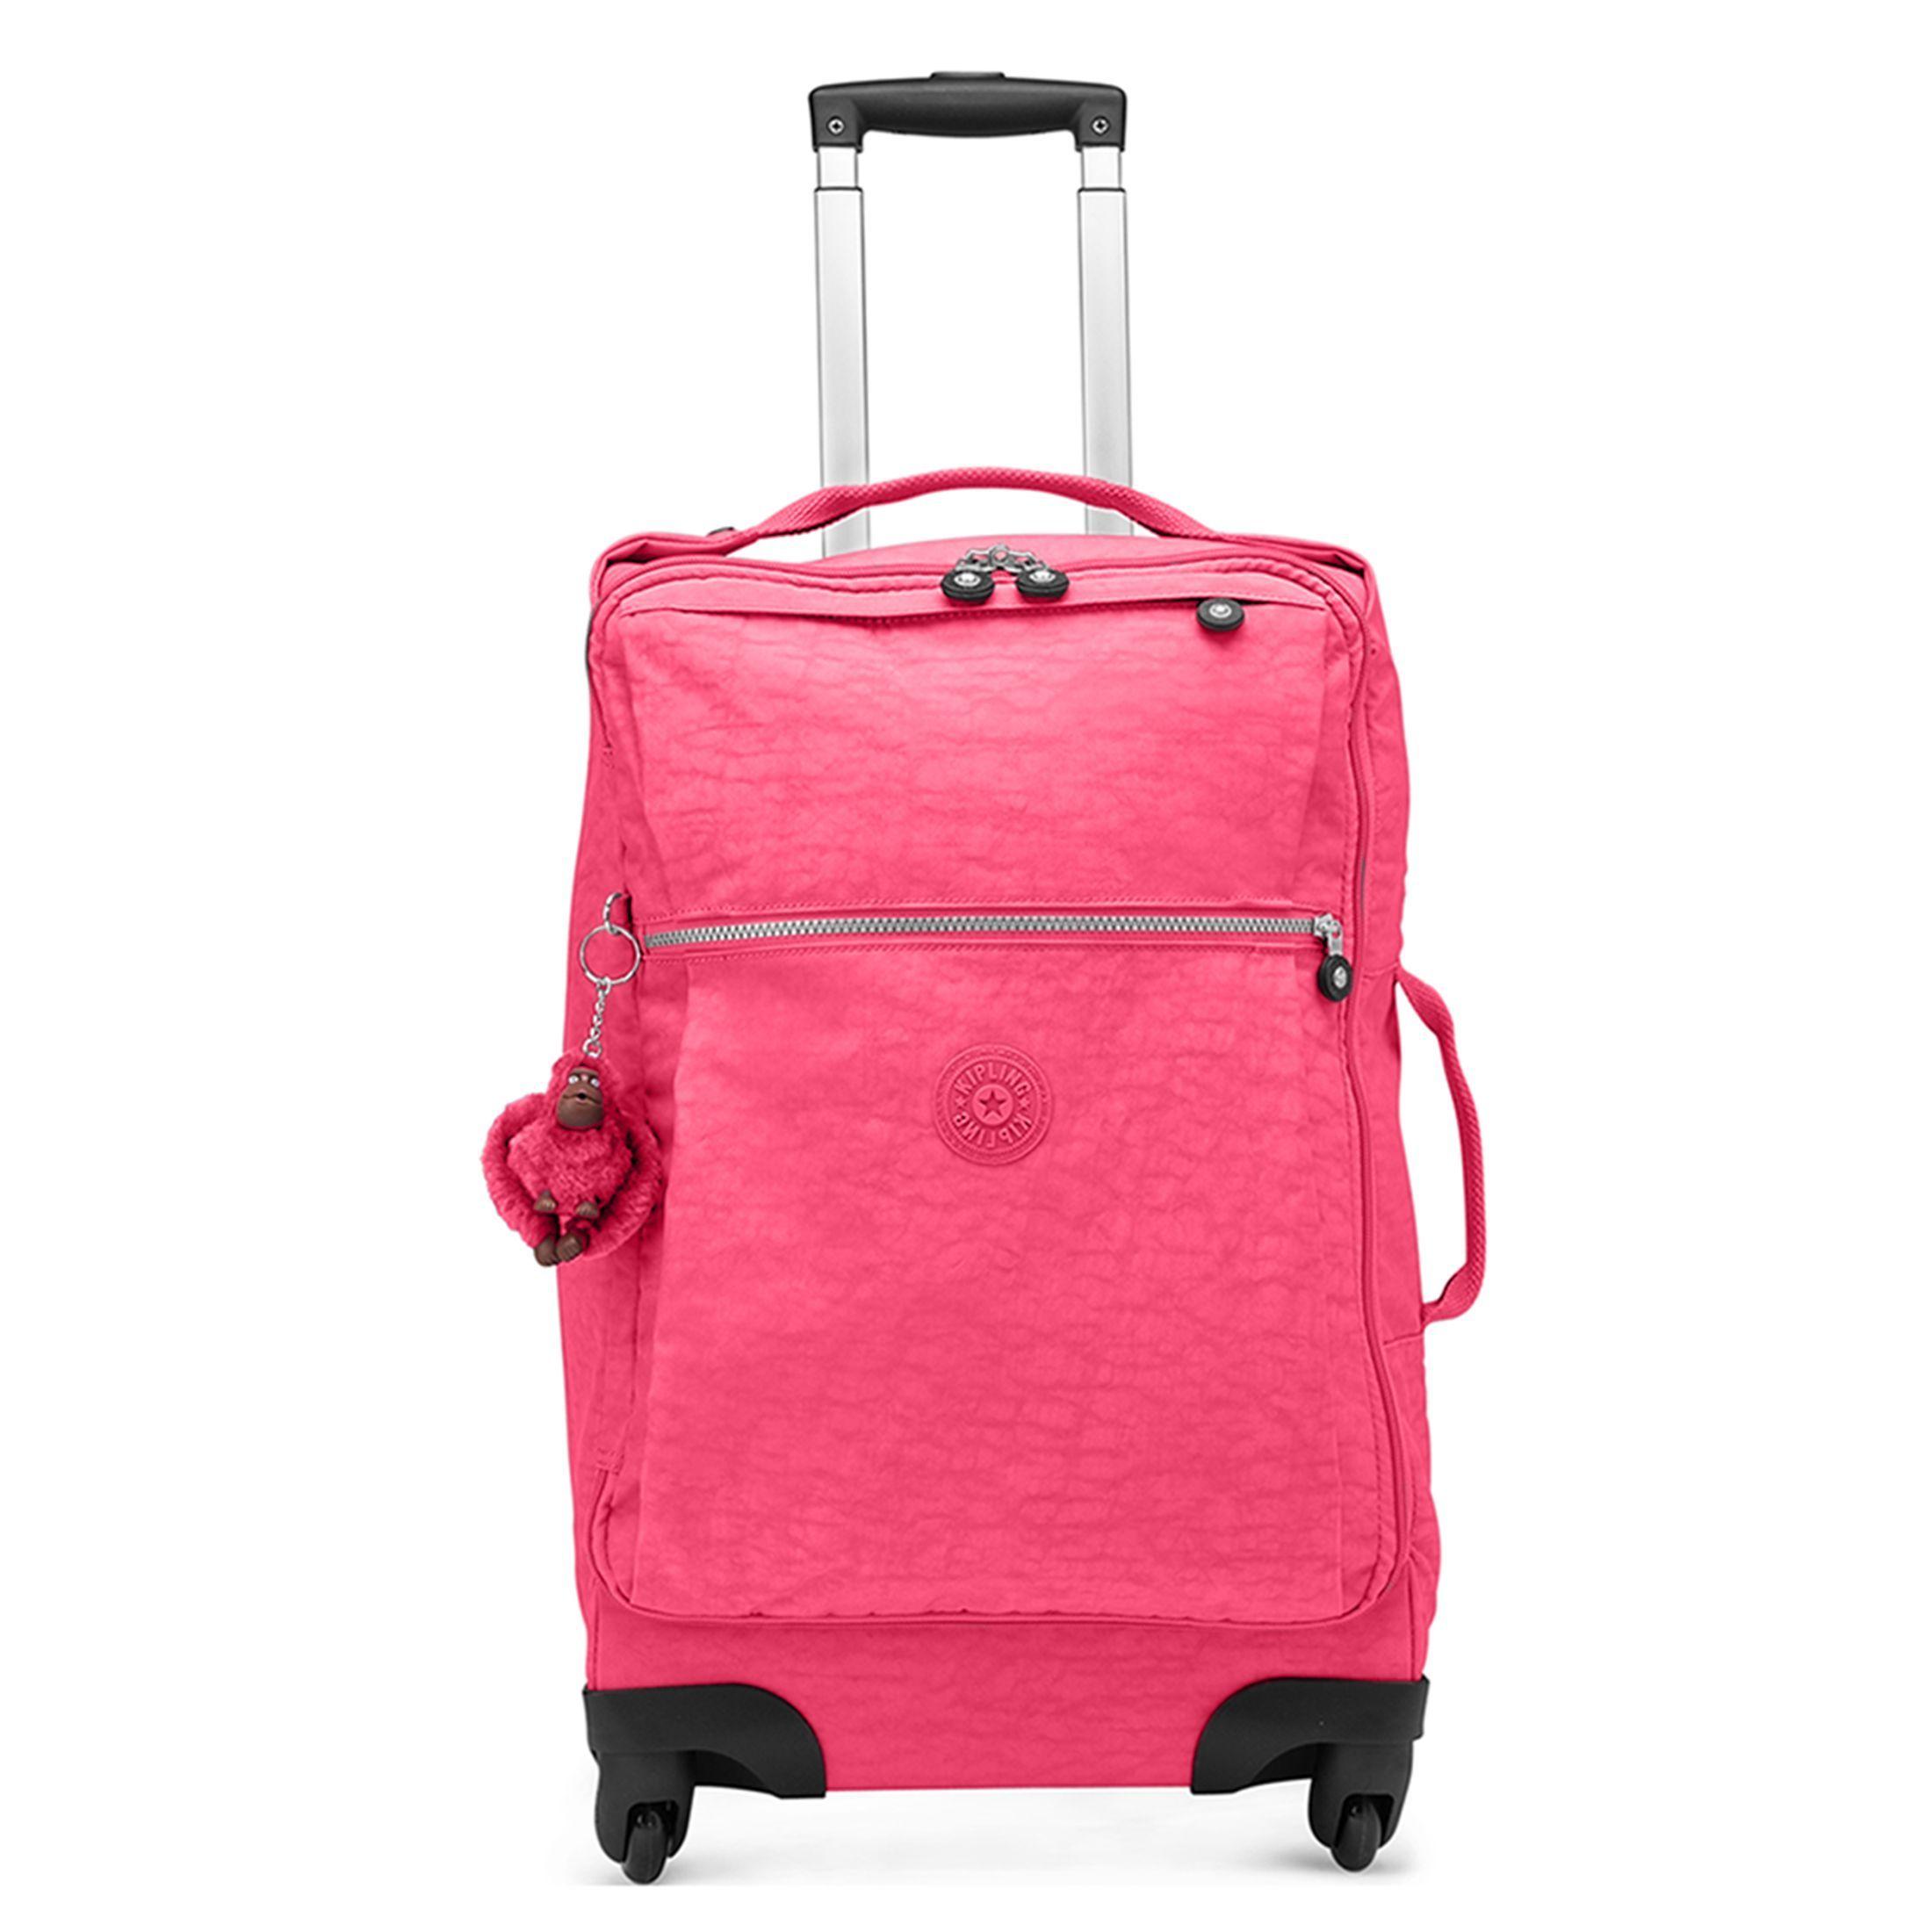 Darcey Small Wheeled Luggage Vibrant Pink Kipling